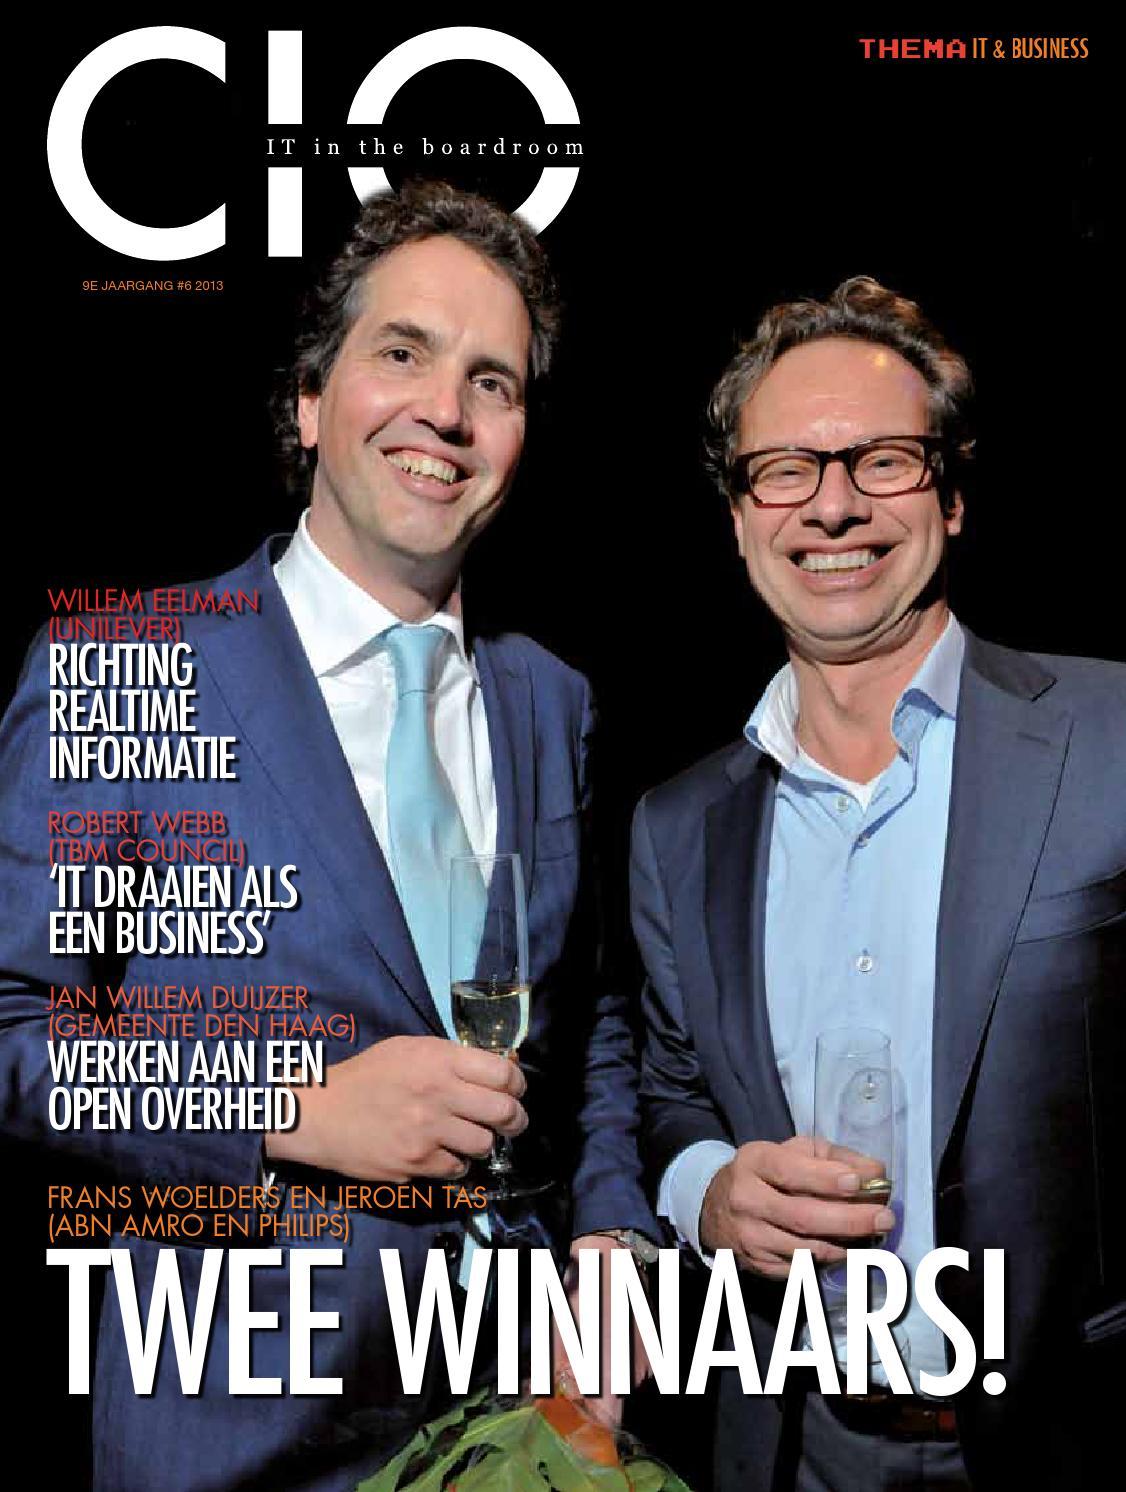 FM Magazine - Finance & IT Special 2015 by Jeppe Kleyngeld - issuu